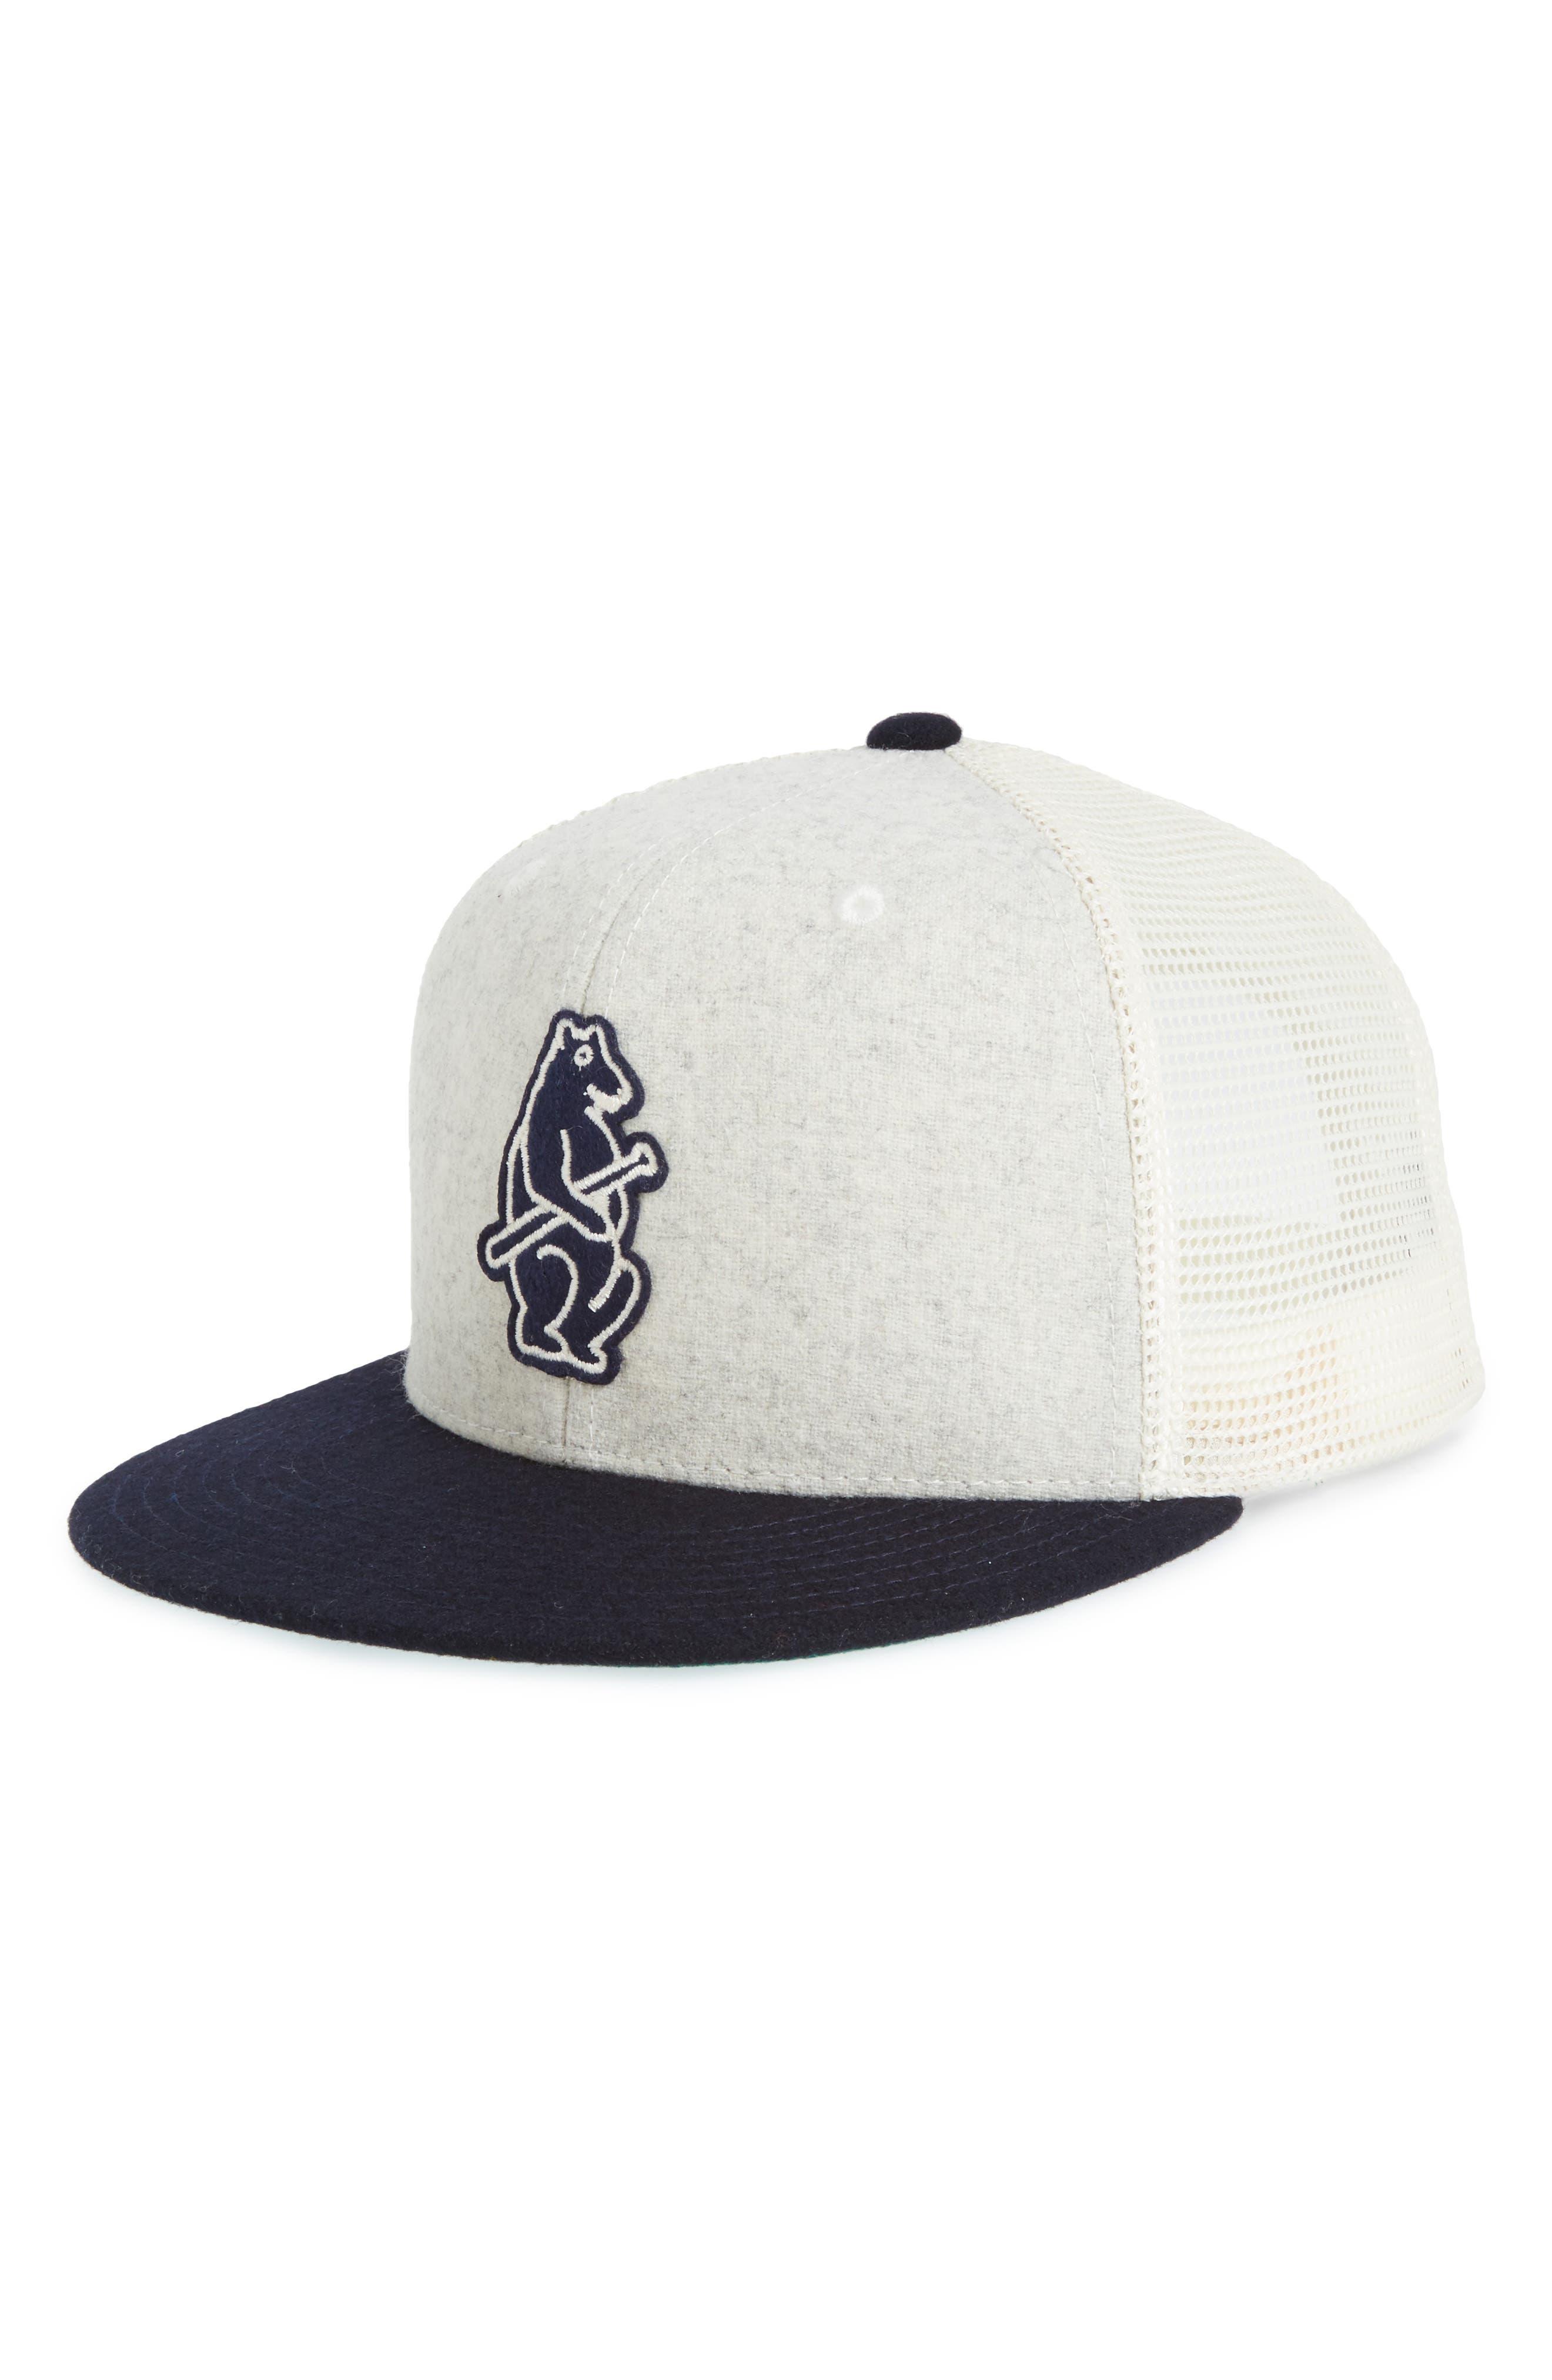 Mr. Potts MLB Snapback Baseball Cap,                         Main,                         color, 112